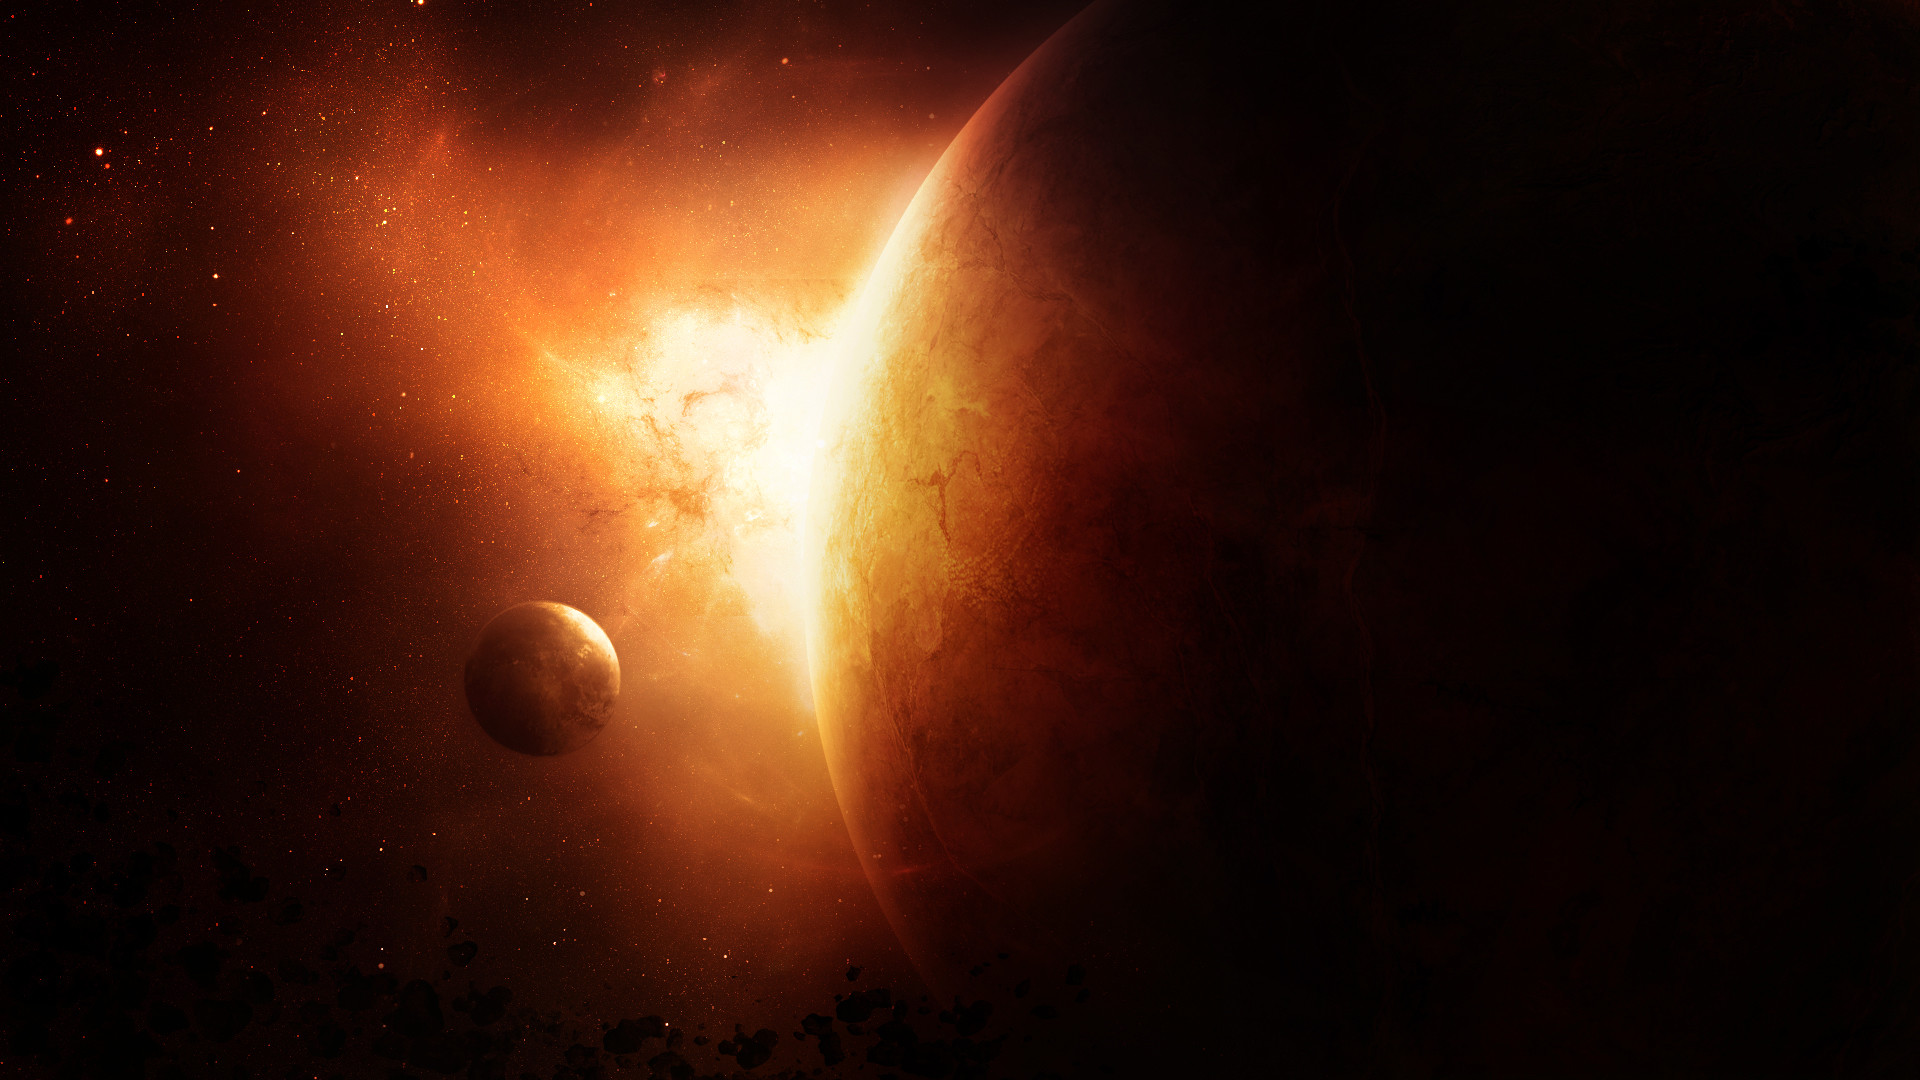 Stargate Space Universe